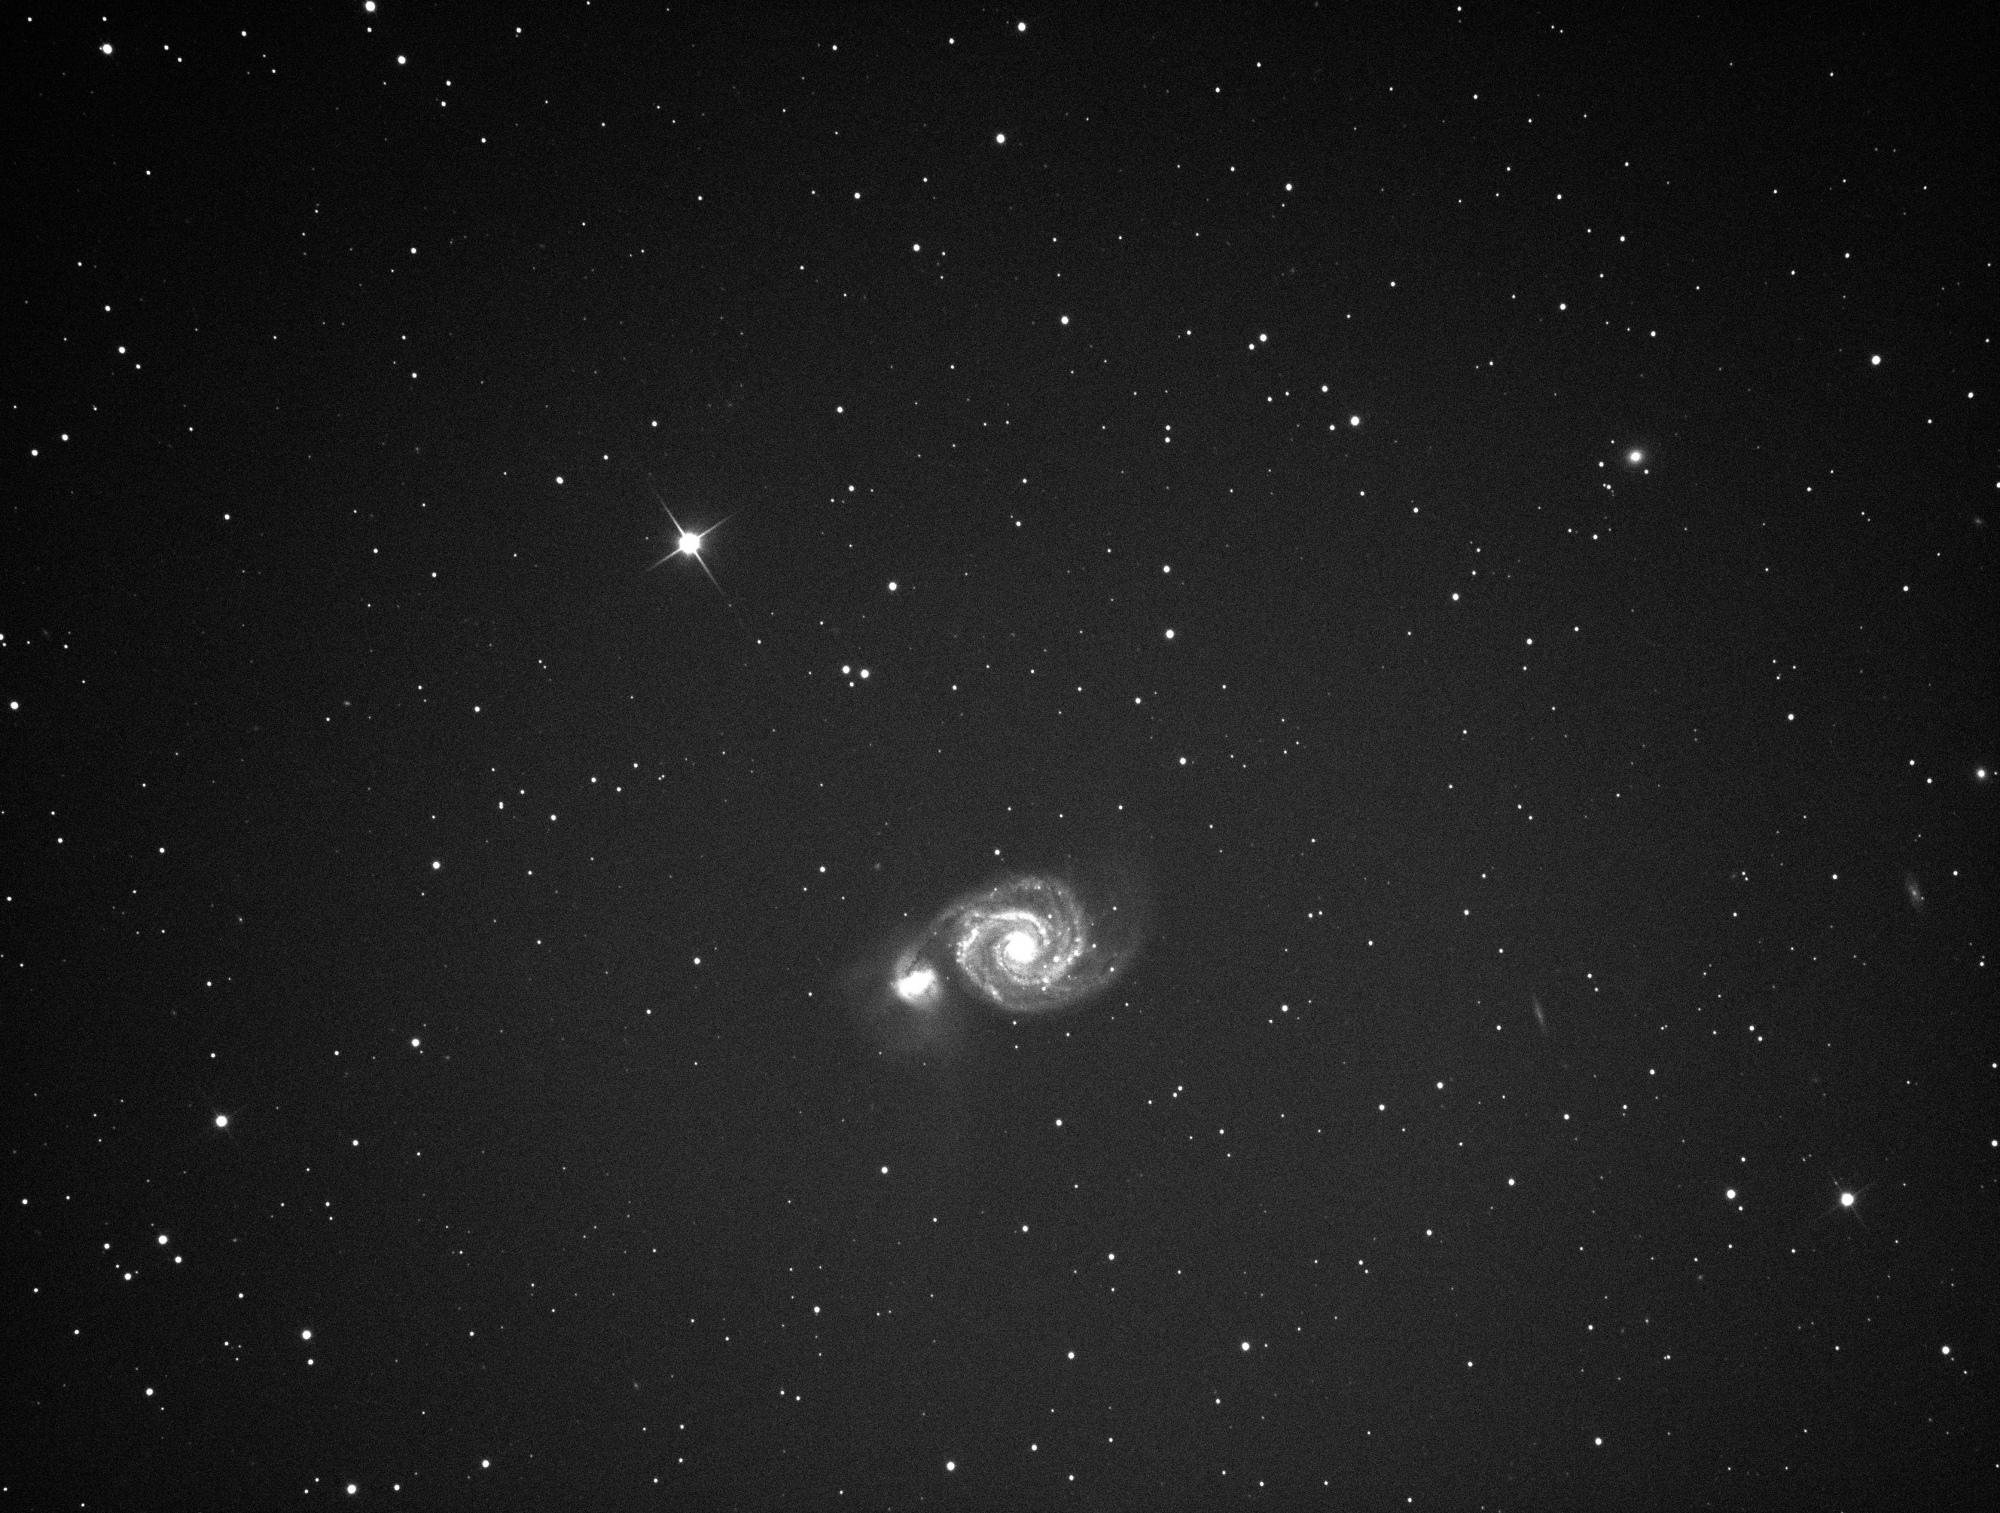 L_LIGHT_2019-01-15_05-25-22_Bin1x1_120s__-10C.thumb.jpg.dbf5a2b0d537f98c95c6b64ec5d2cad1.jpg